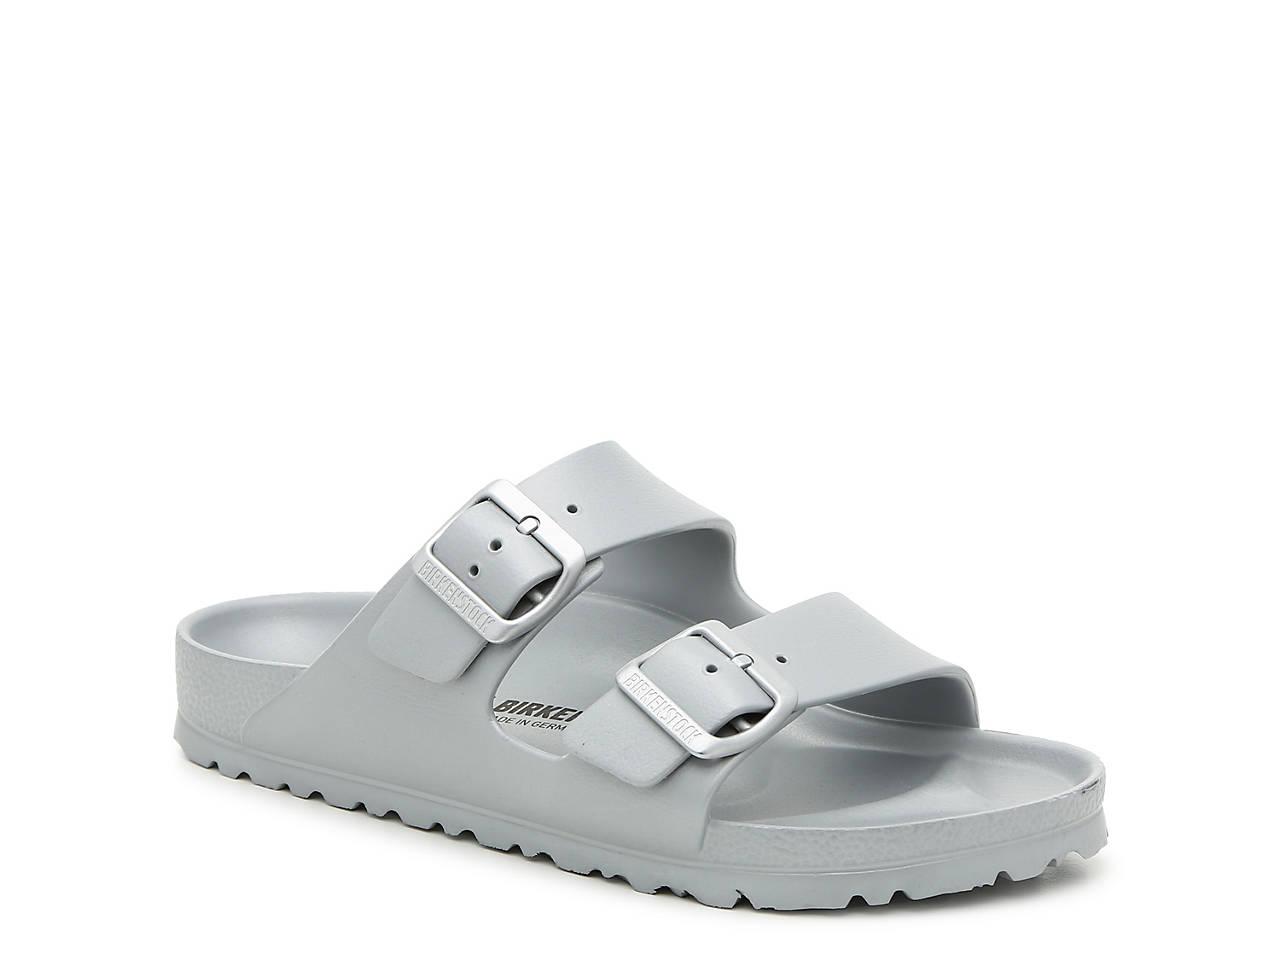 e00daa6e971b Birkenstock Arizona Essentials Slide Sandal - Women s Women s Shoes ...